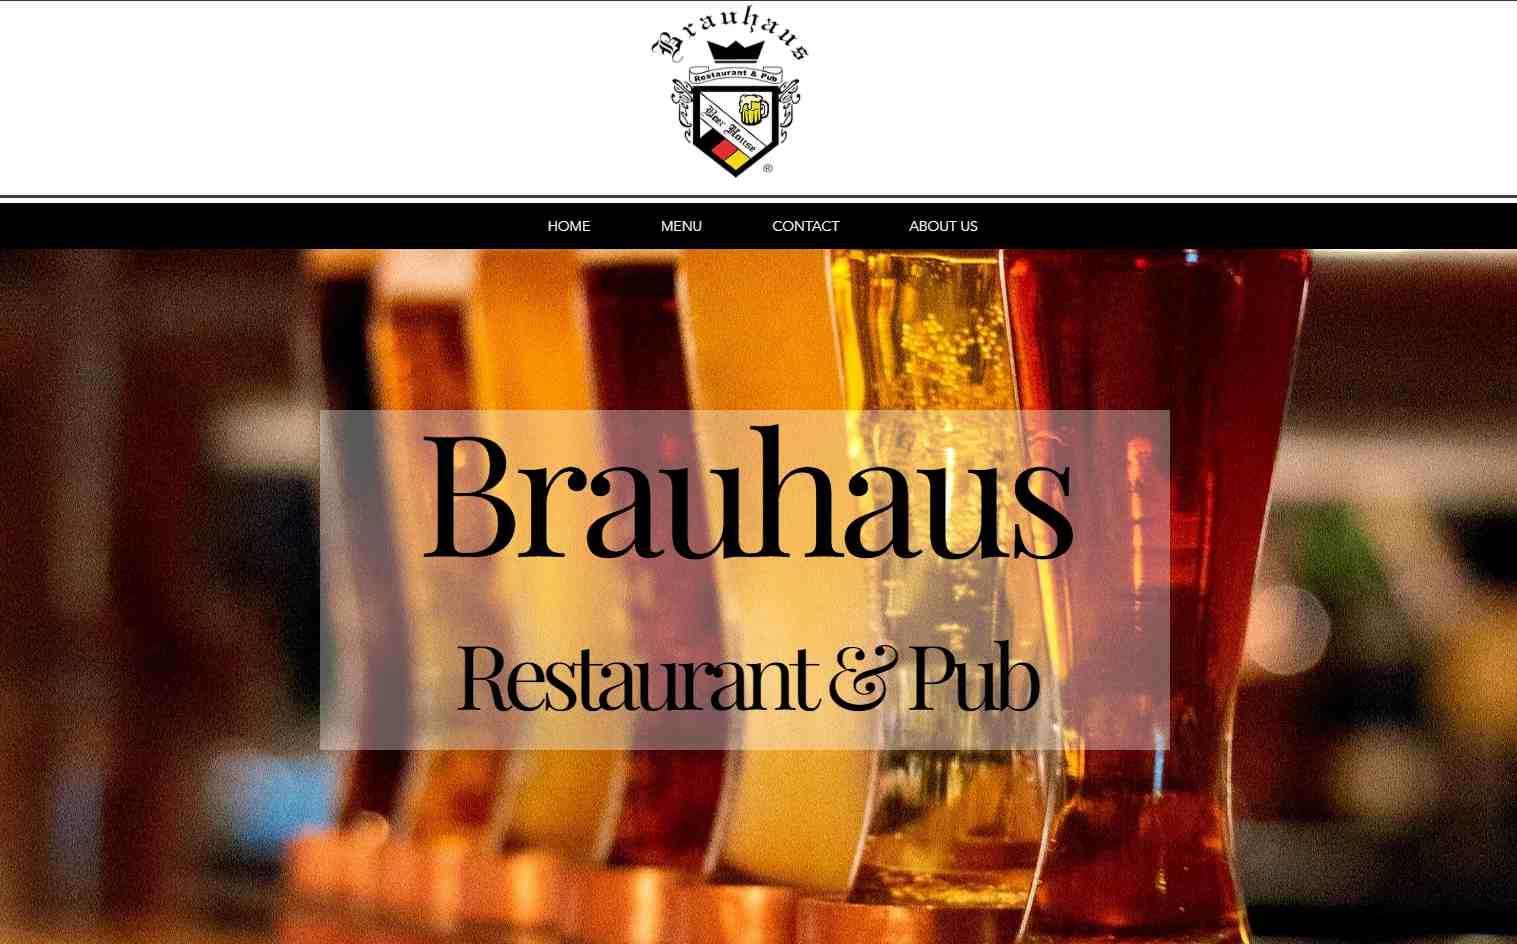 brauhaus sg Top German Restaurants in Singapore